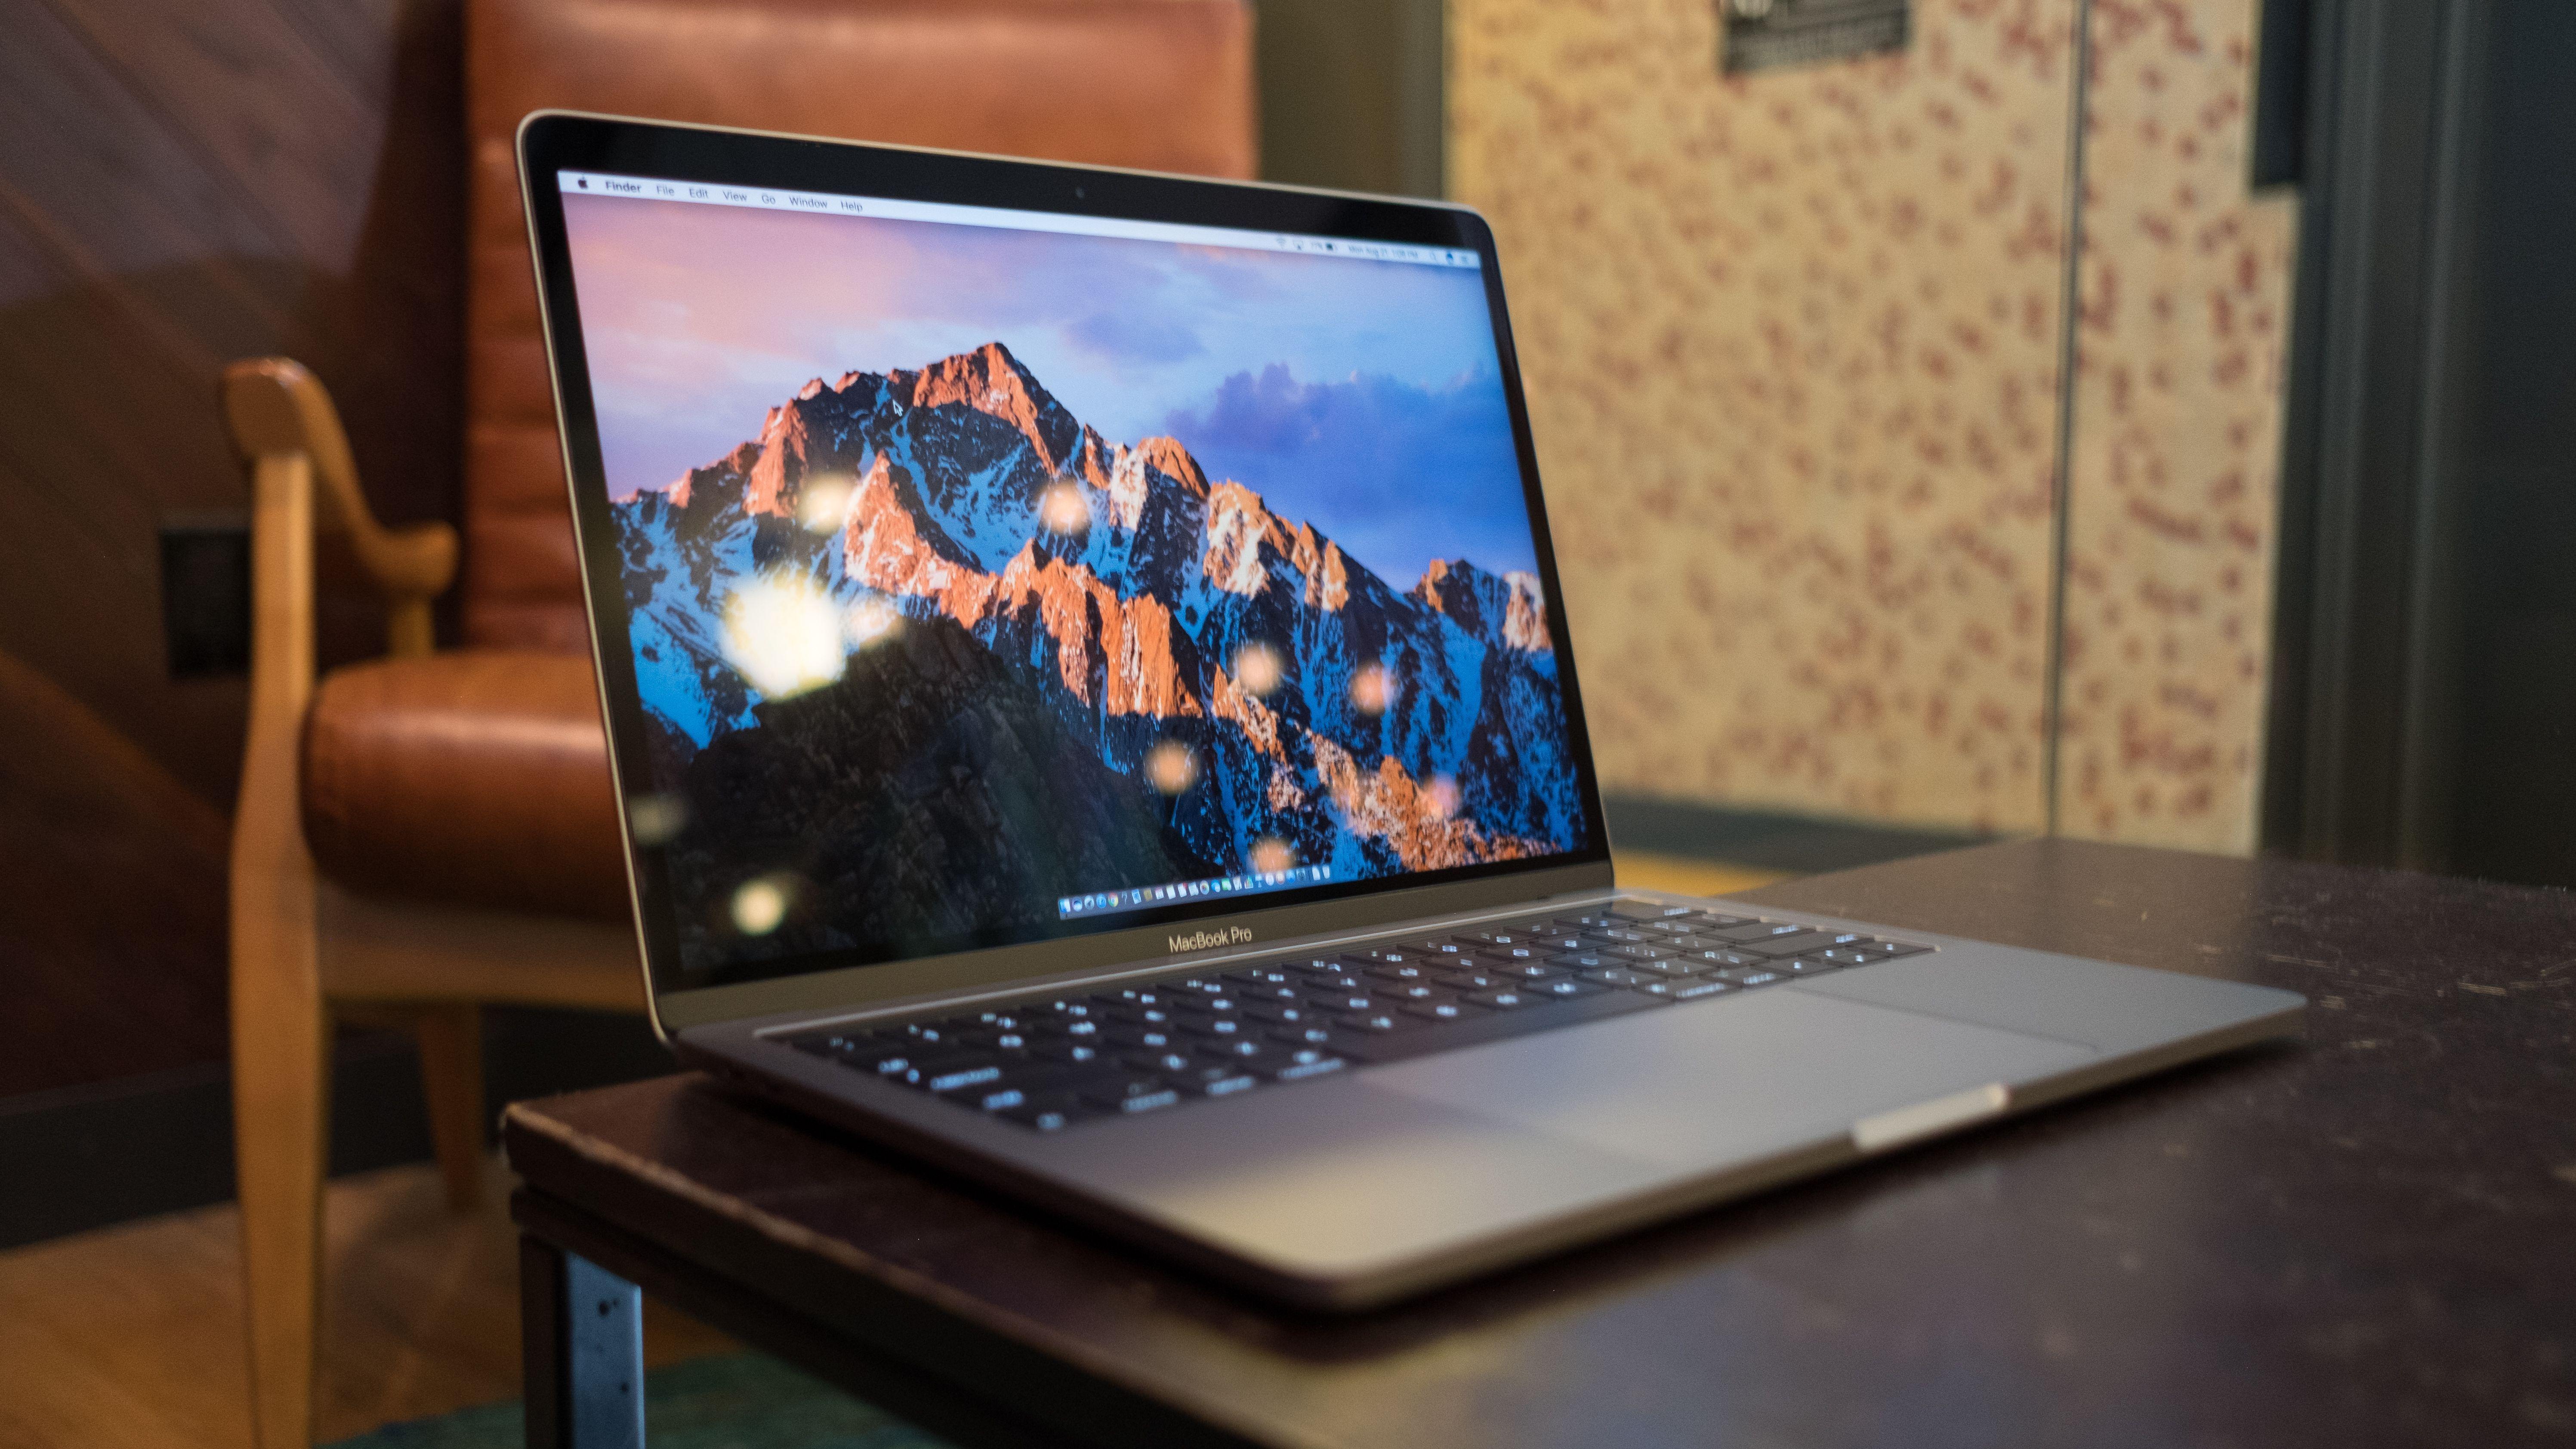 Macbook Pro 2018 Release Date News And Rumors Macbookproaccessories Macbookprotips Macbook Pro Macbook Macbook Pro Sale